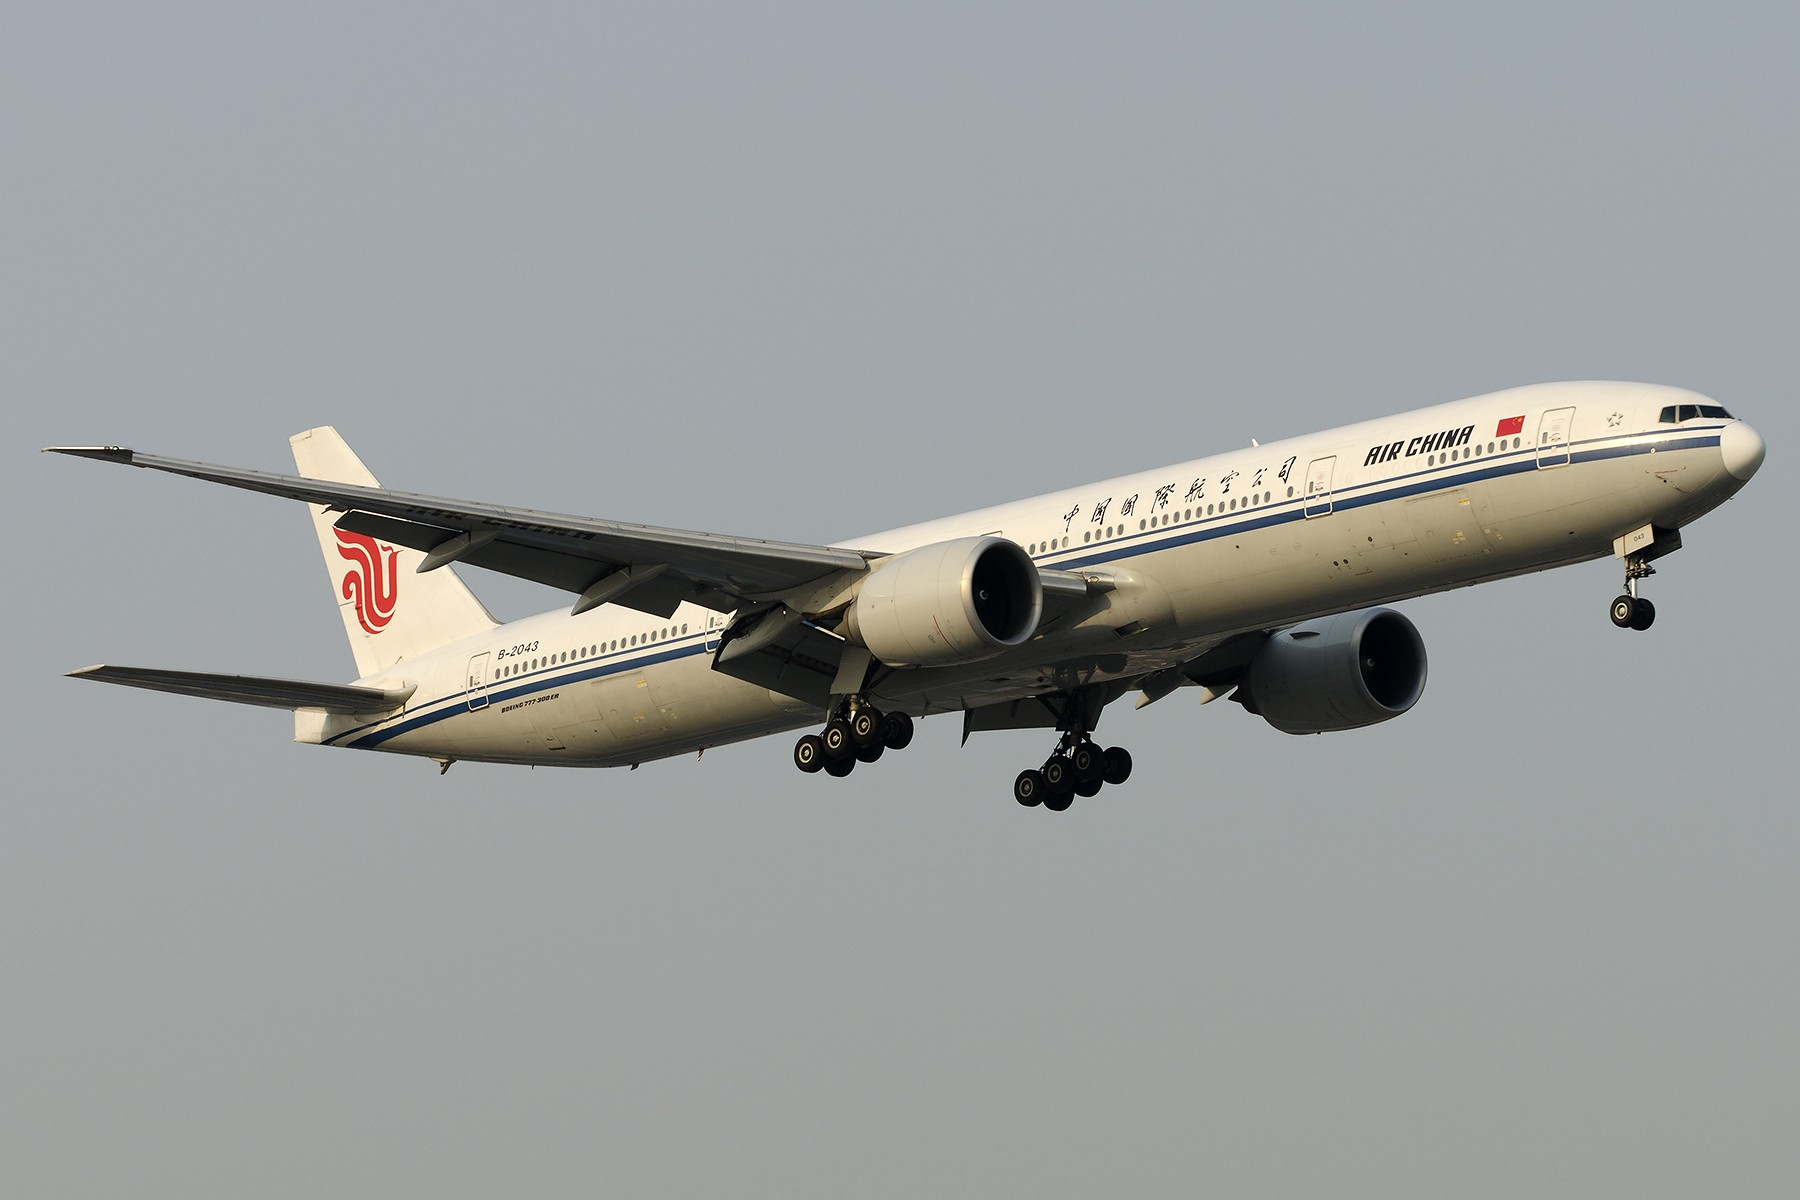 Re:[原创][原创]【SHA拍机*1800大图】4月拍的了,记得那天好货还挺多 BOEING 777-300ER B-2043 中国上海虹桥国际机场